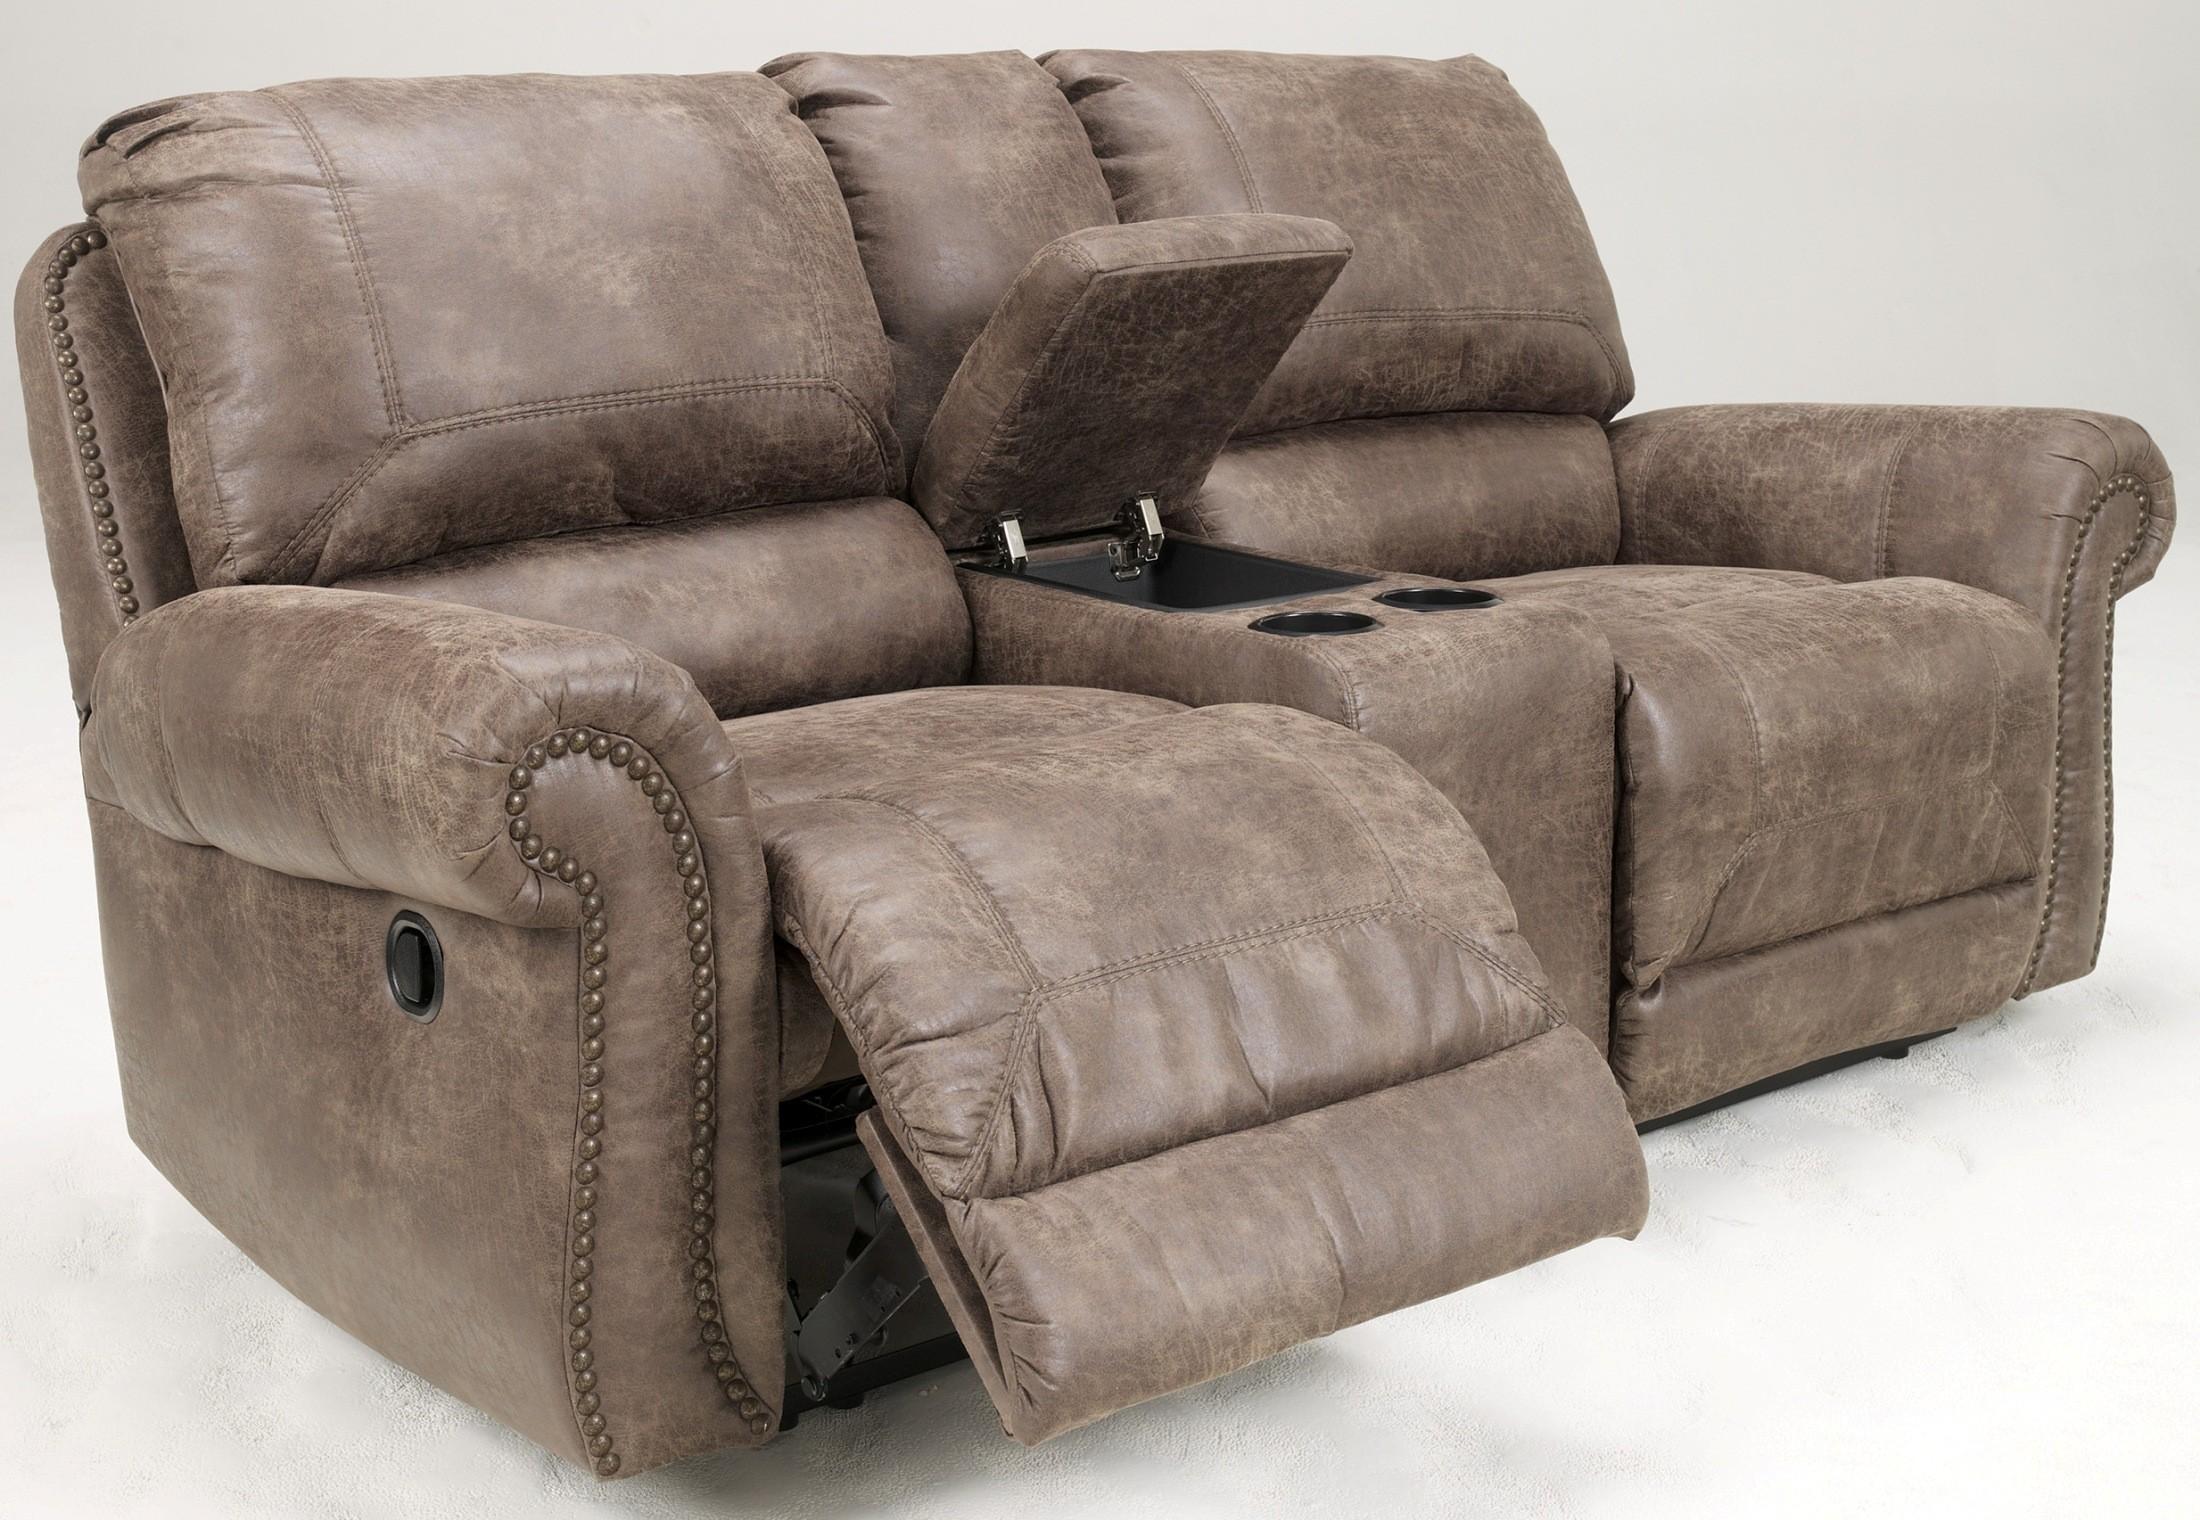 motion furniture pdx wayfair red studio barrel recliner reclining simmons reviews loveseat double genevieve